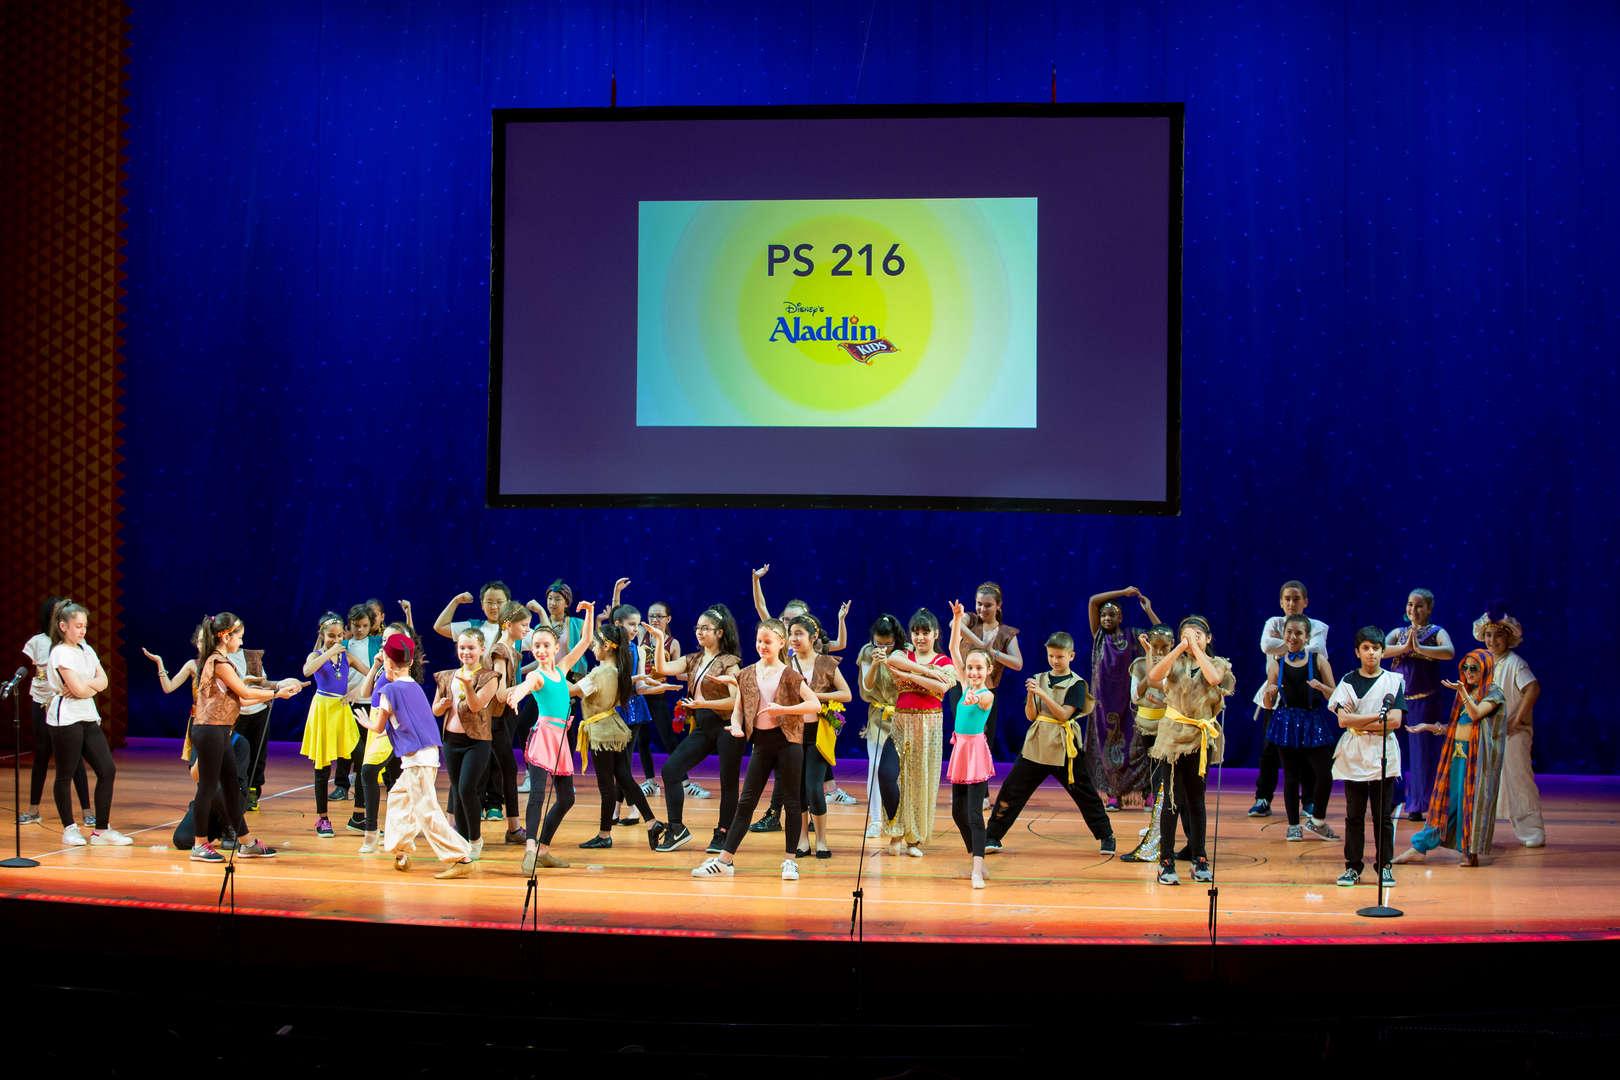 P.S. 216 Aladdin Kids School Performance